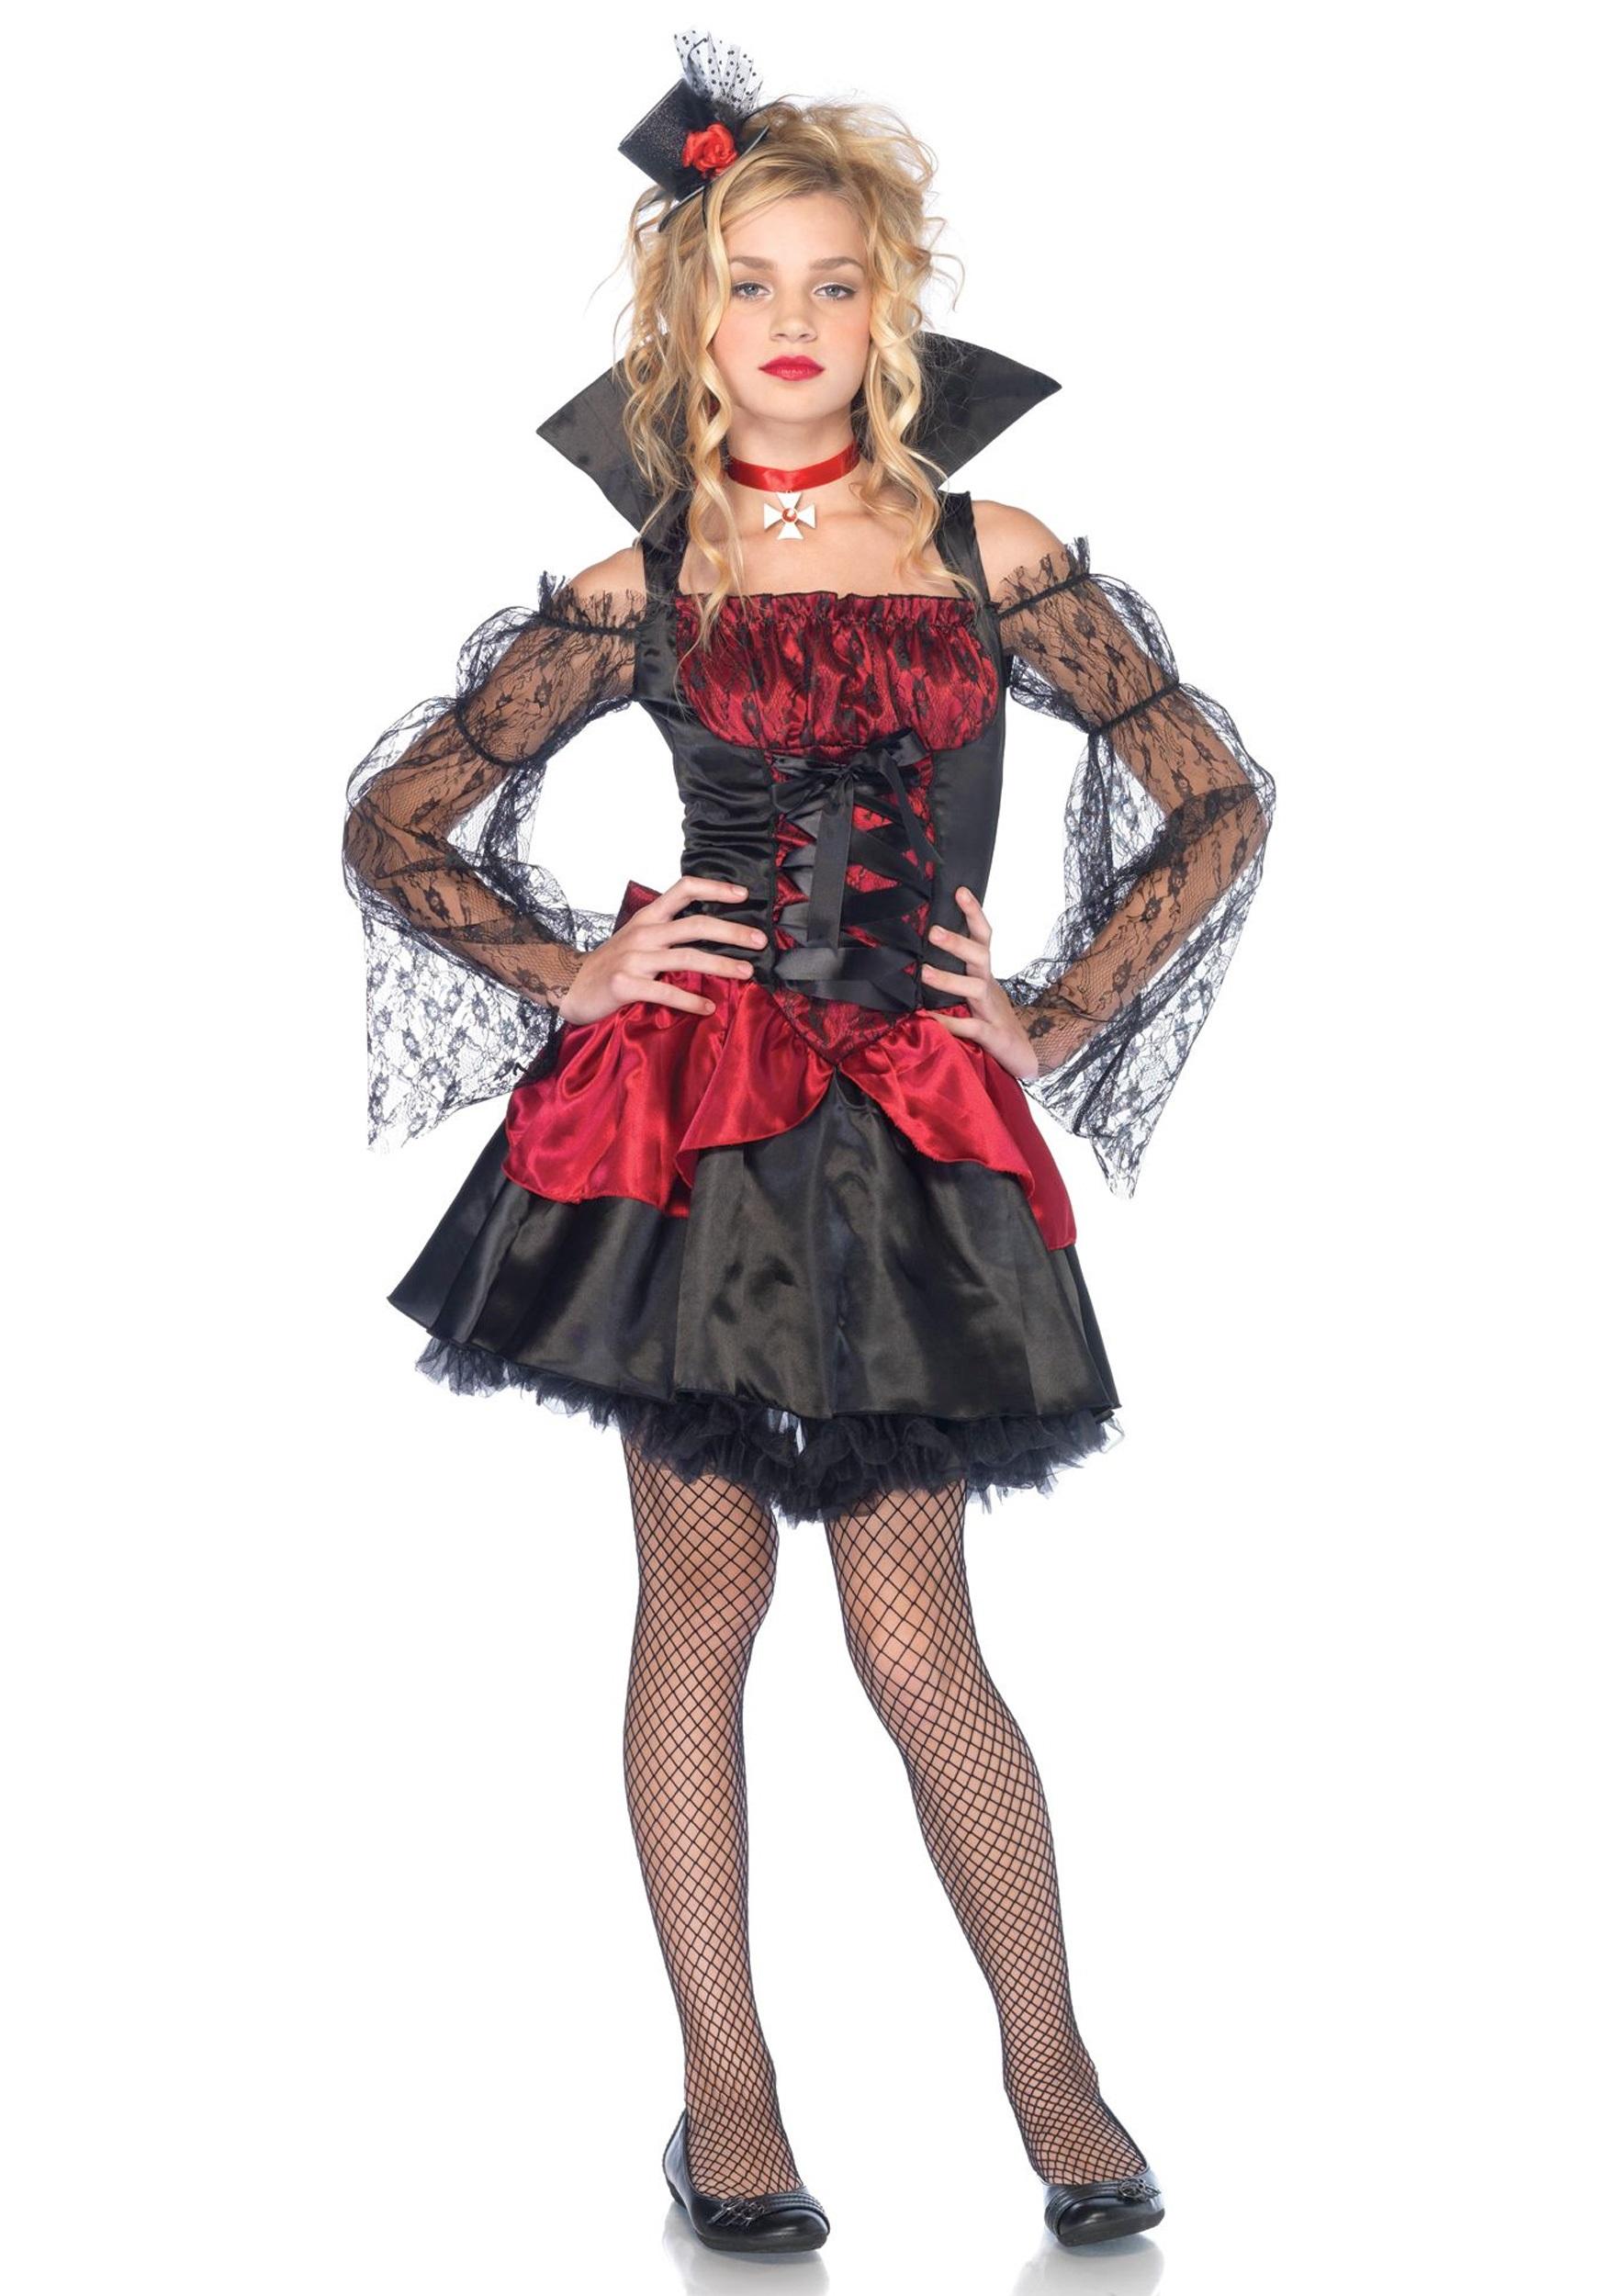 Teen Victorian V&ira Costume  sc 1 st  Halloween Costumes & Teen Victorian Vampira Costume - Halloween Costumes